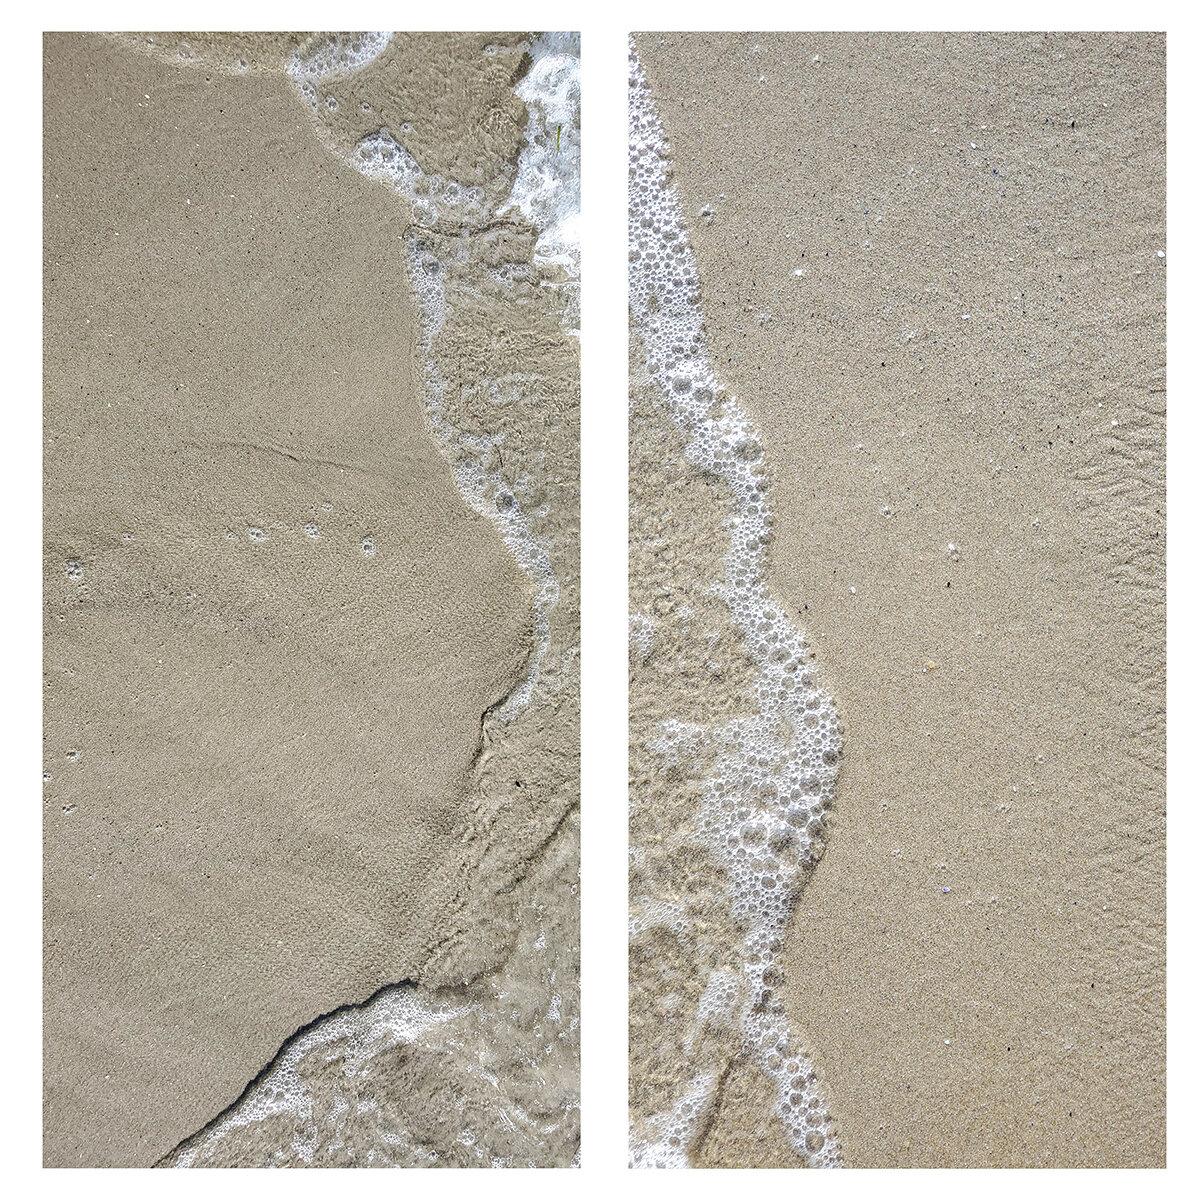 2 sand 20x20.SMALL.jpg